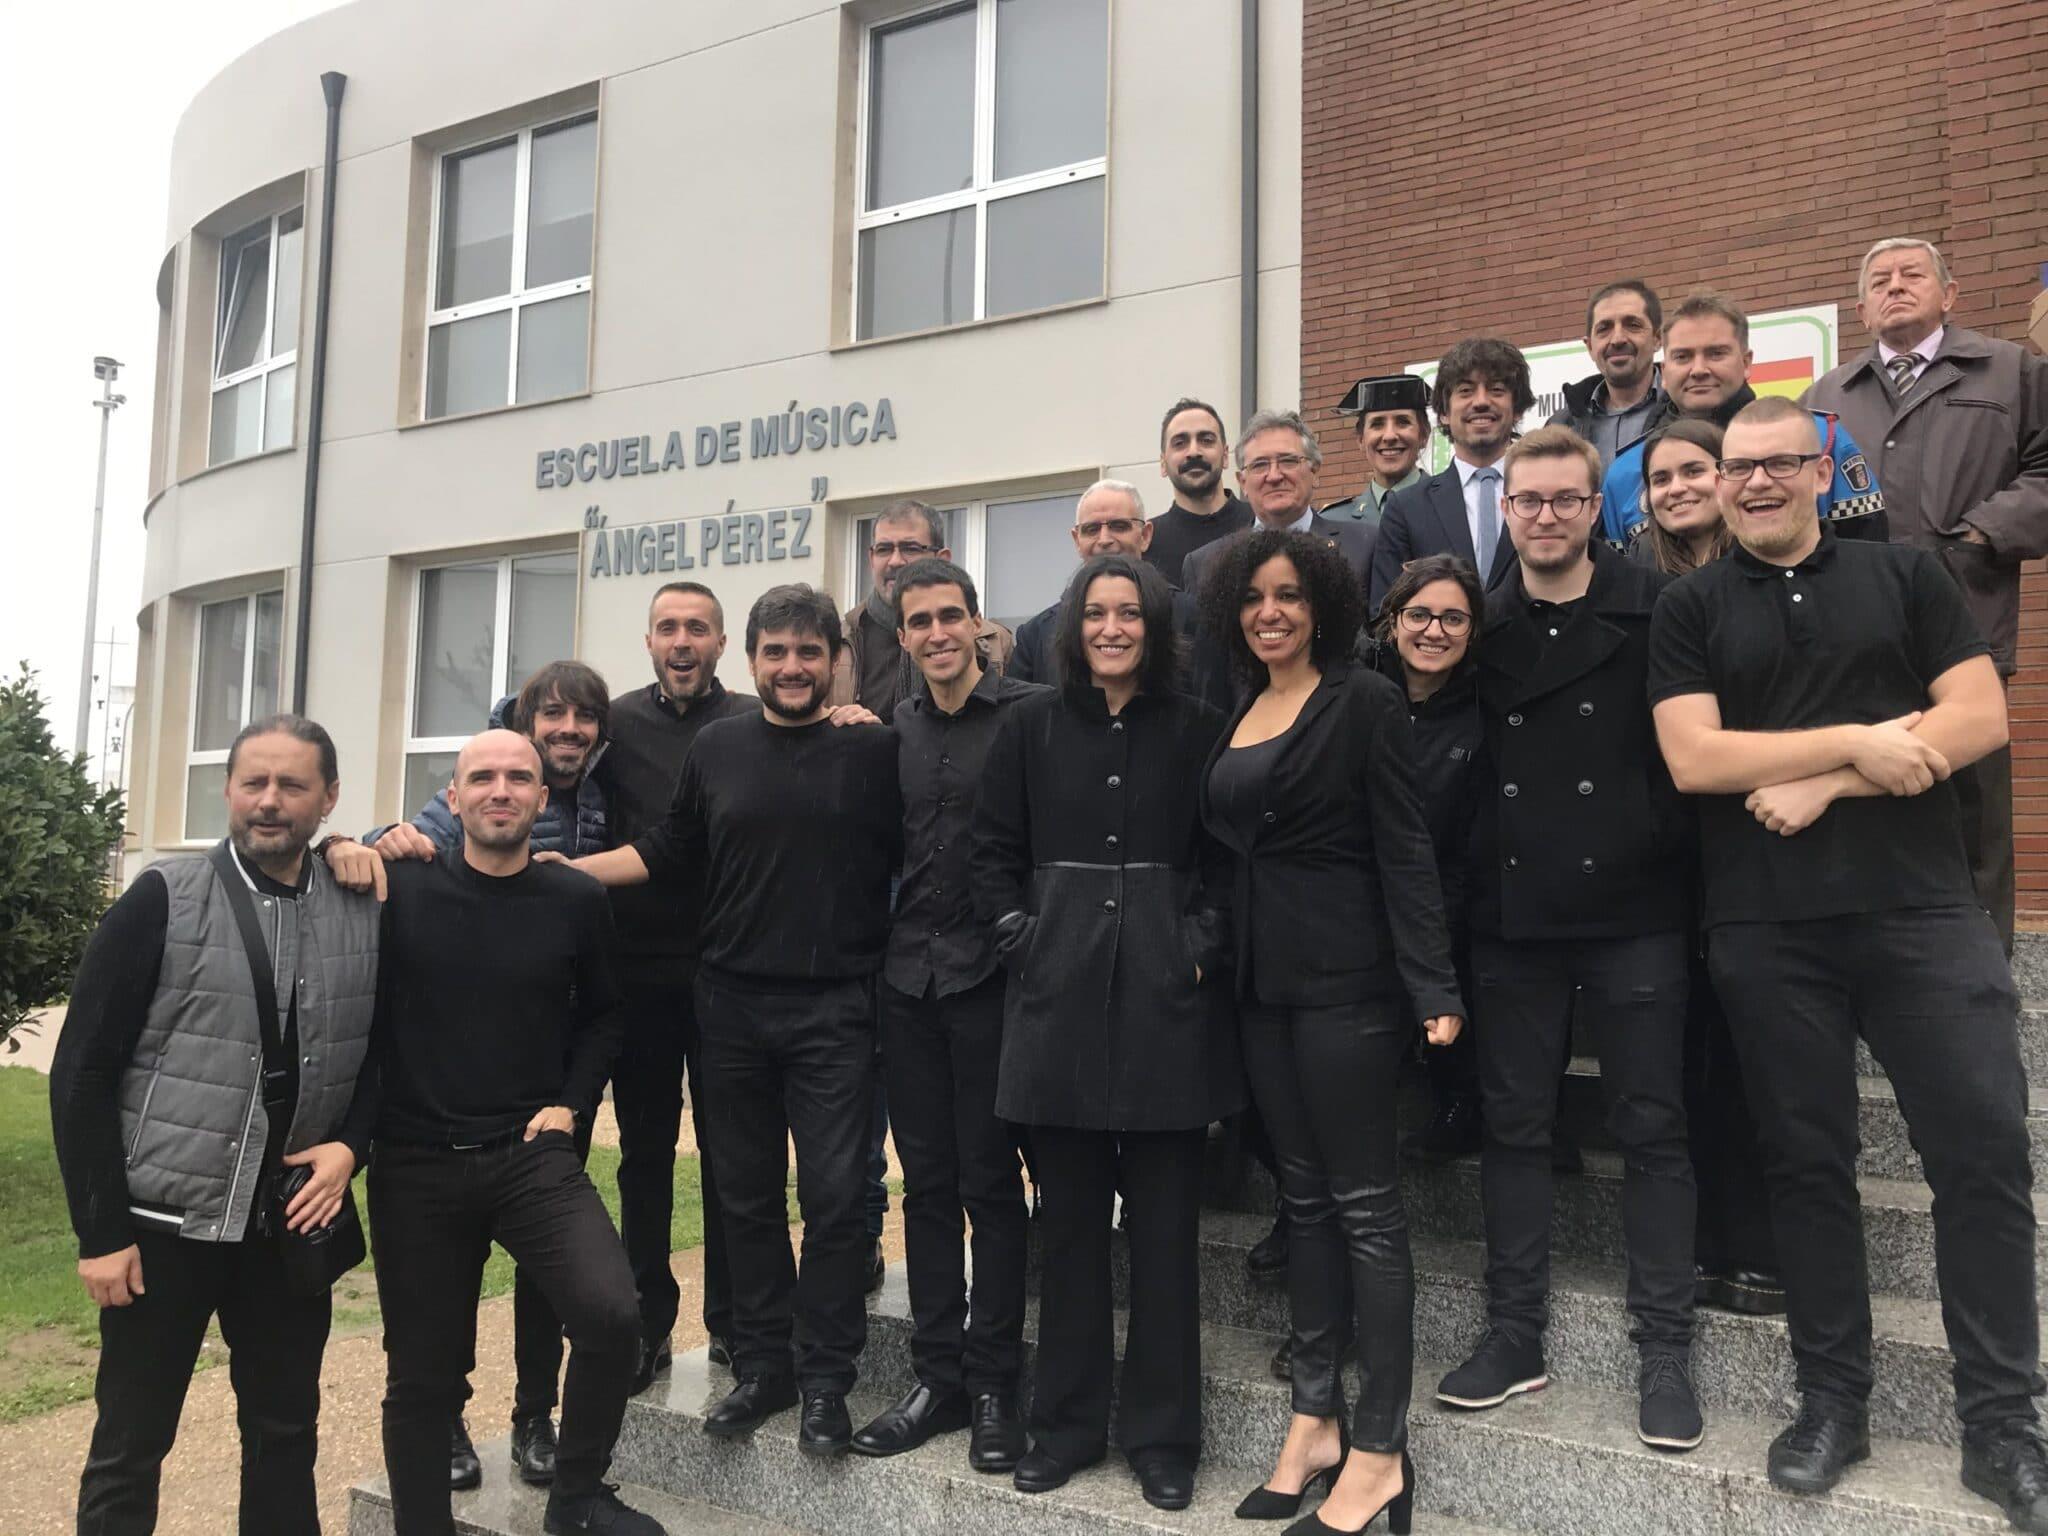 Inauguración Escuela de Música